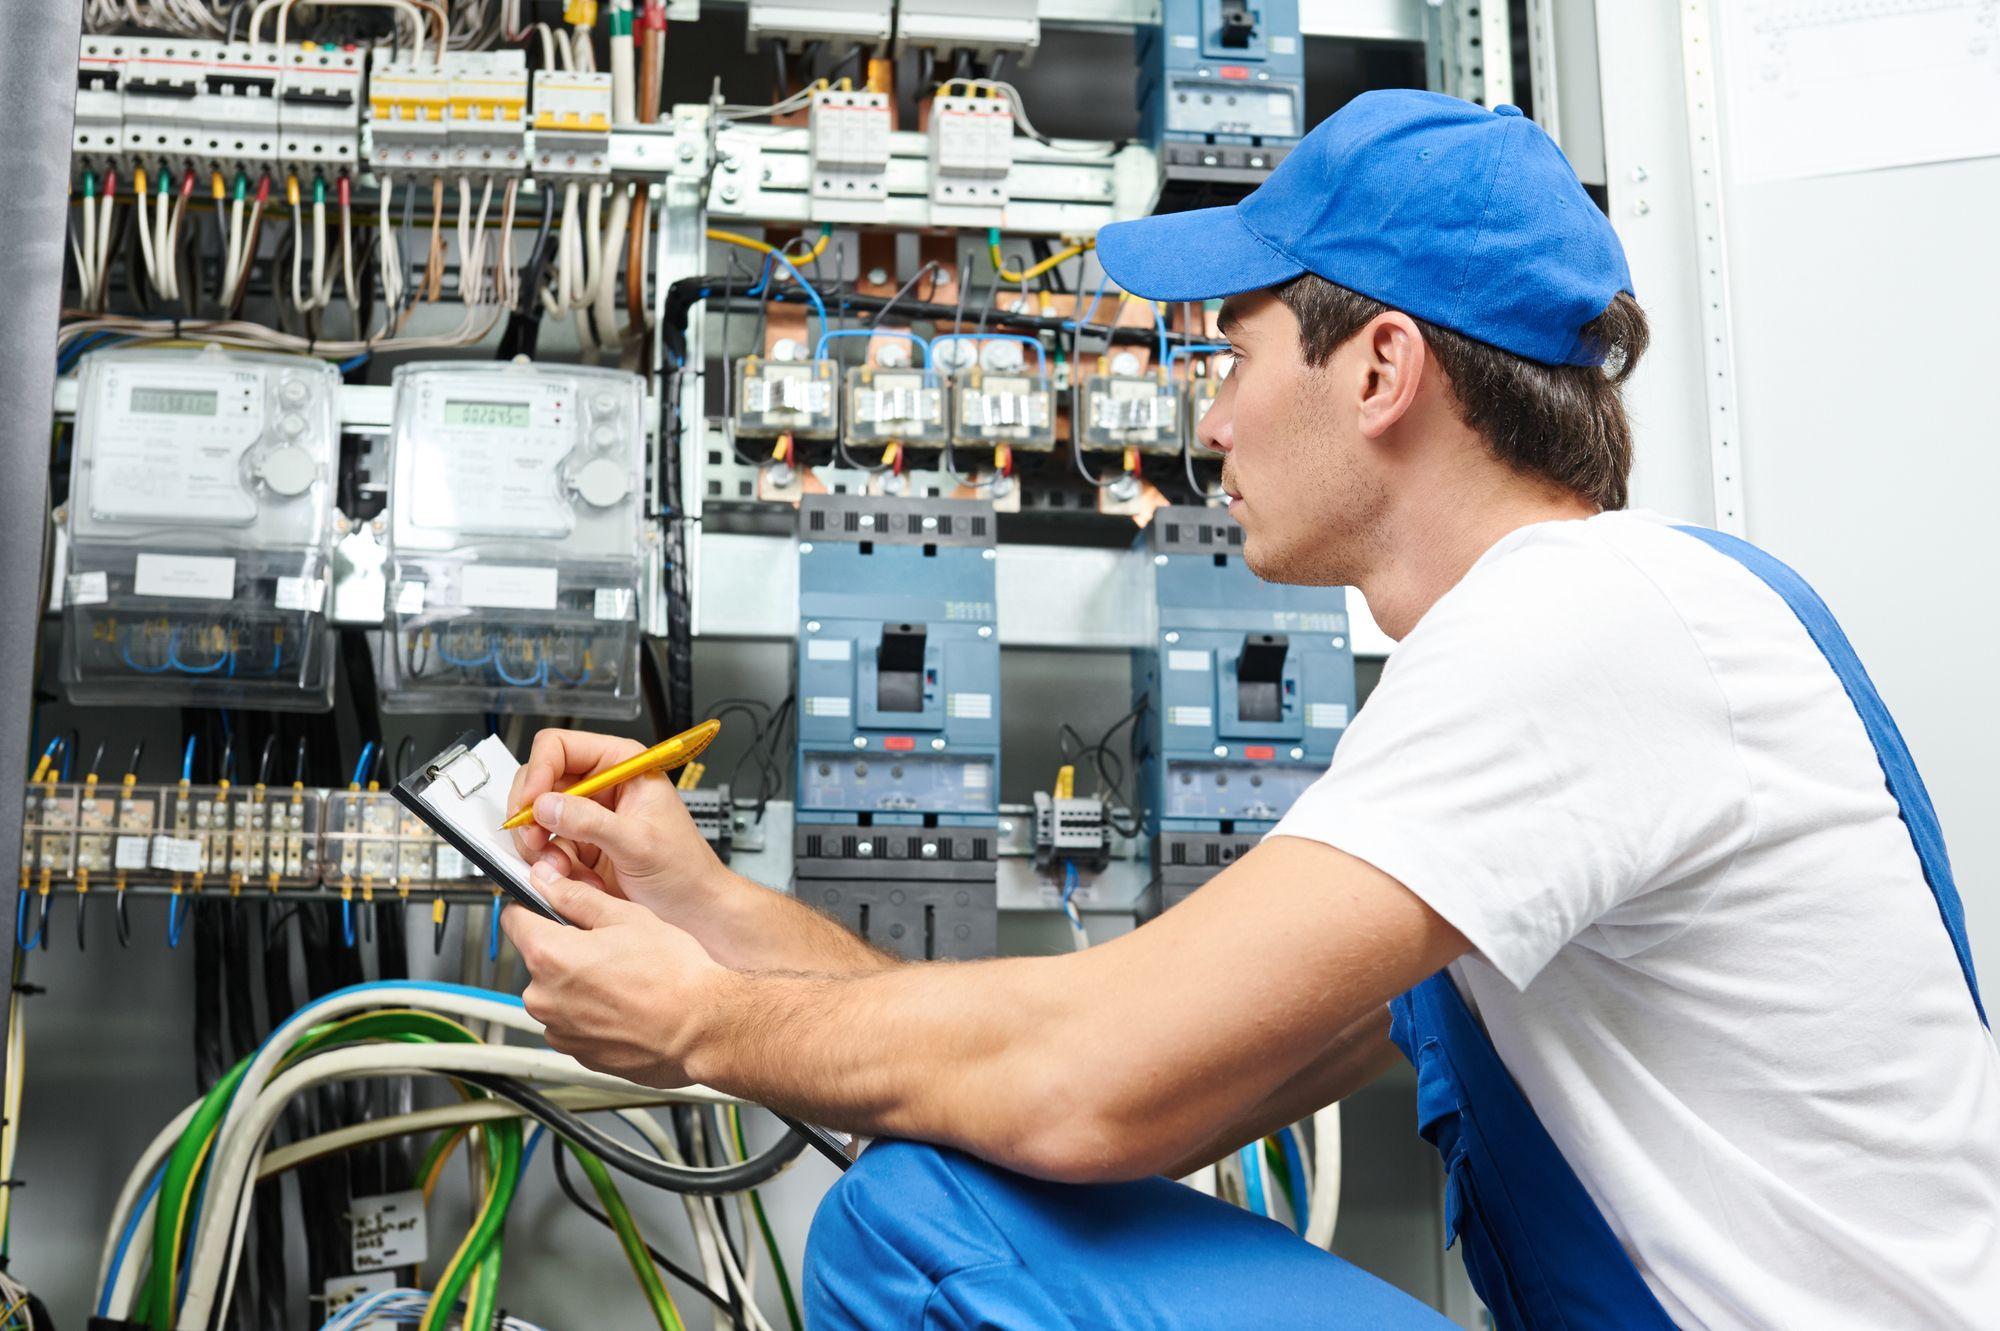 Http Www Prismvs Com Prism Preventative Maintenance Software Html Prism S Preventative Maintena Electrical Panel Electrician